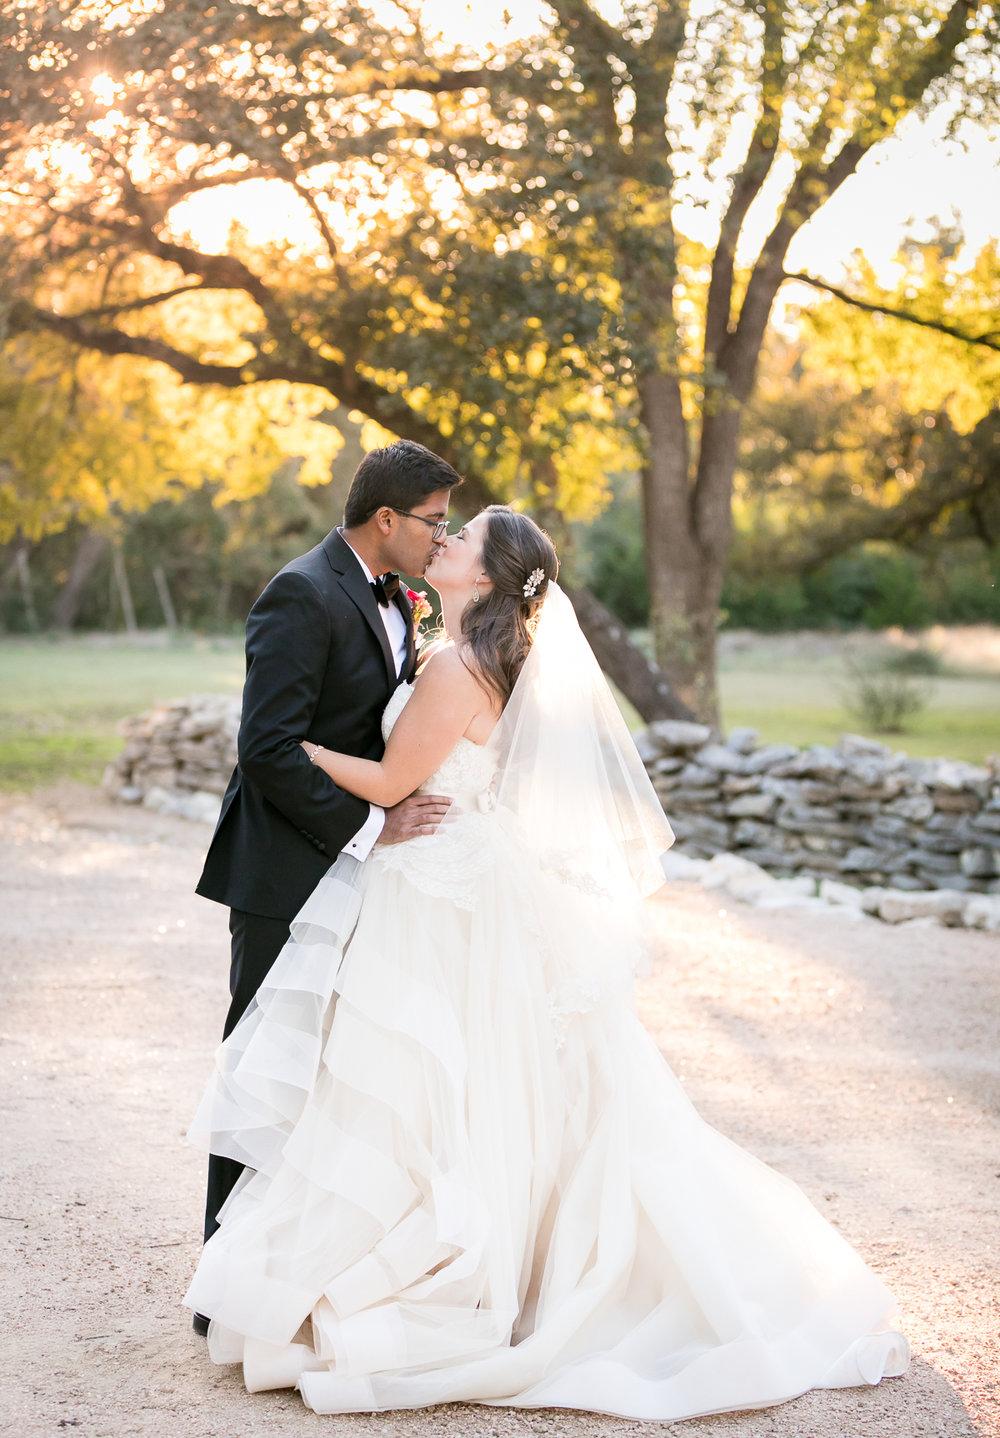 hill-country-wedding-photographer-003.jpg